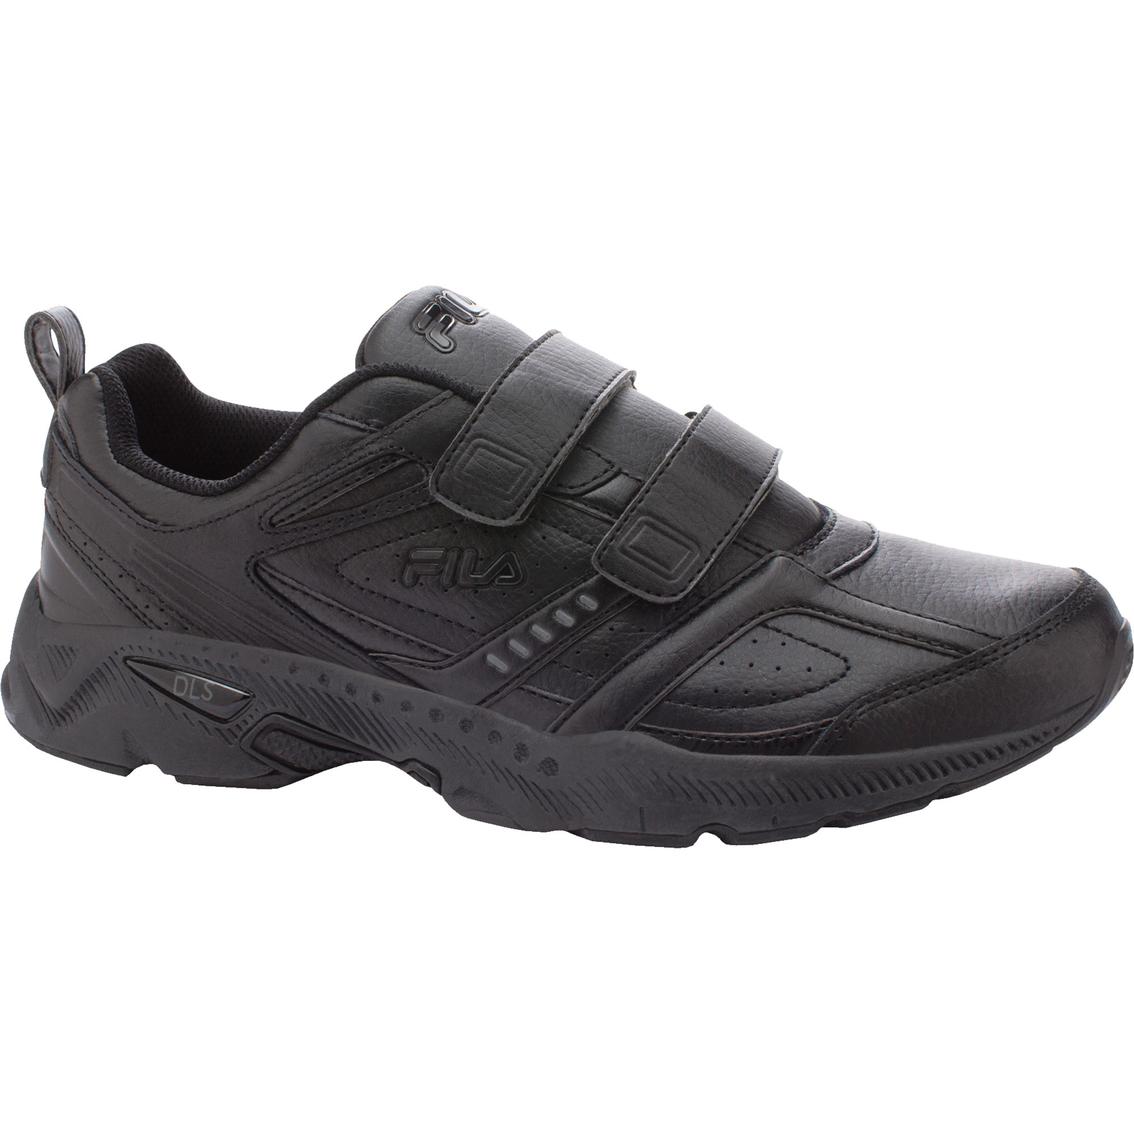 14a0fc9d8cc89 Fila Men s Memory Capture 2 Strap Walking Shoes